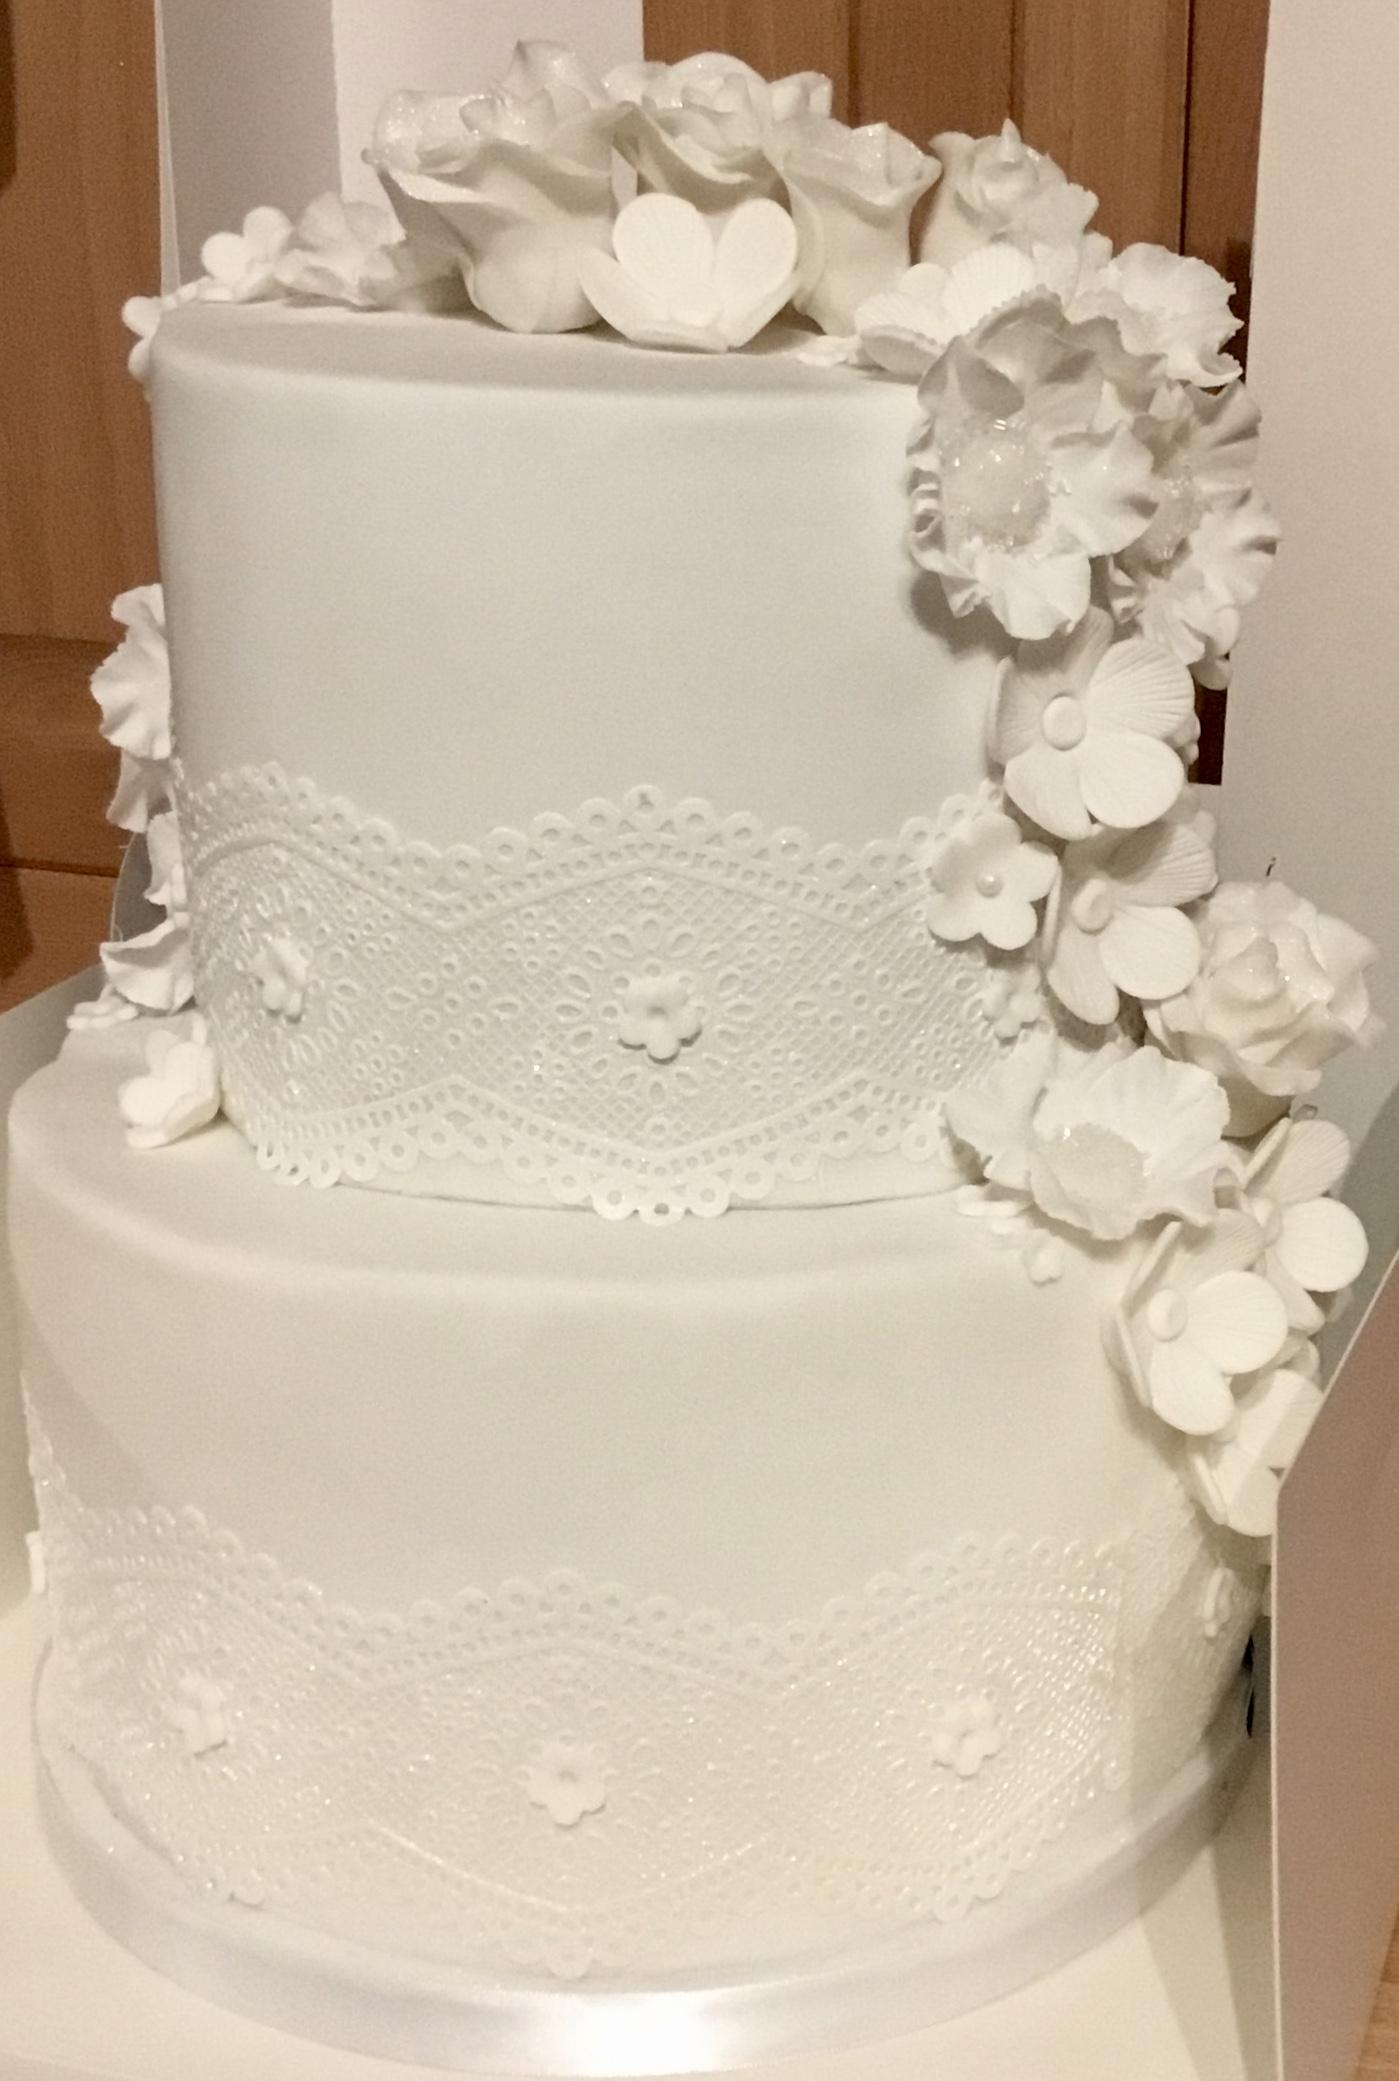 Bake Yorkshire white flower floral lace wedding anniversary cake